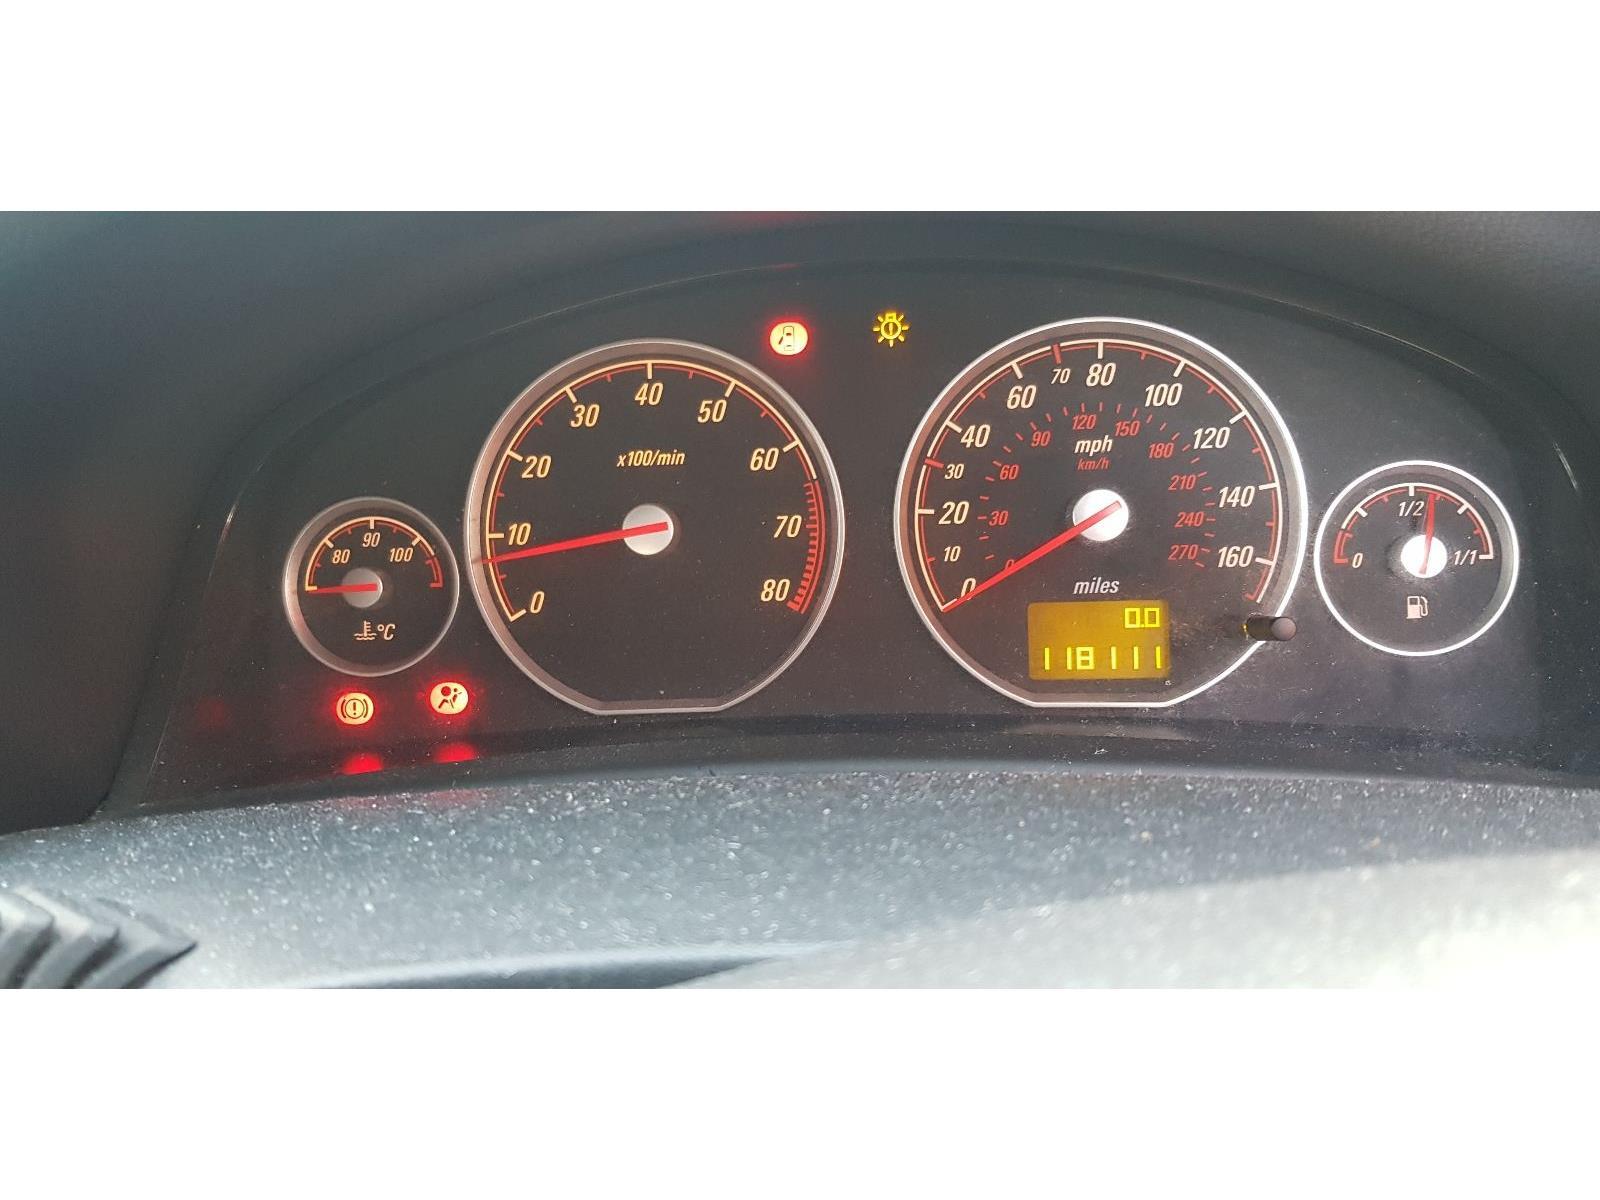 2006 vauxhall vectra 2005 to 2010 sri 2 0l manual petrol